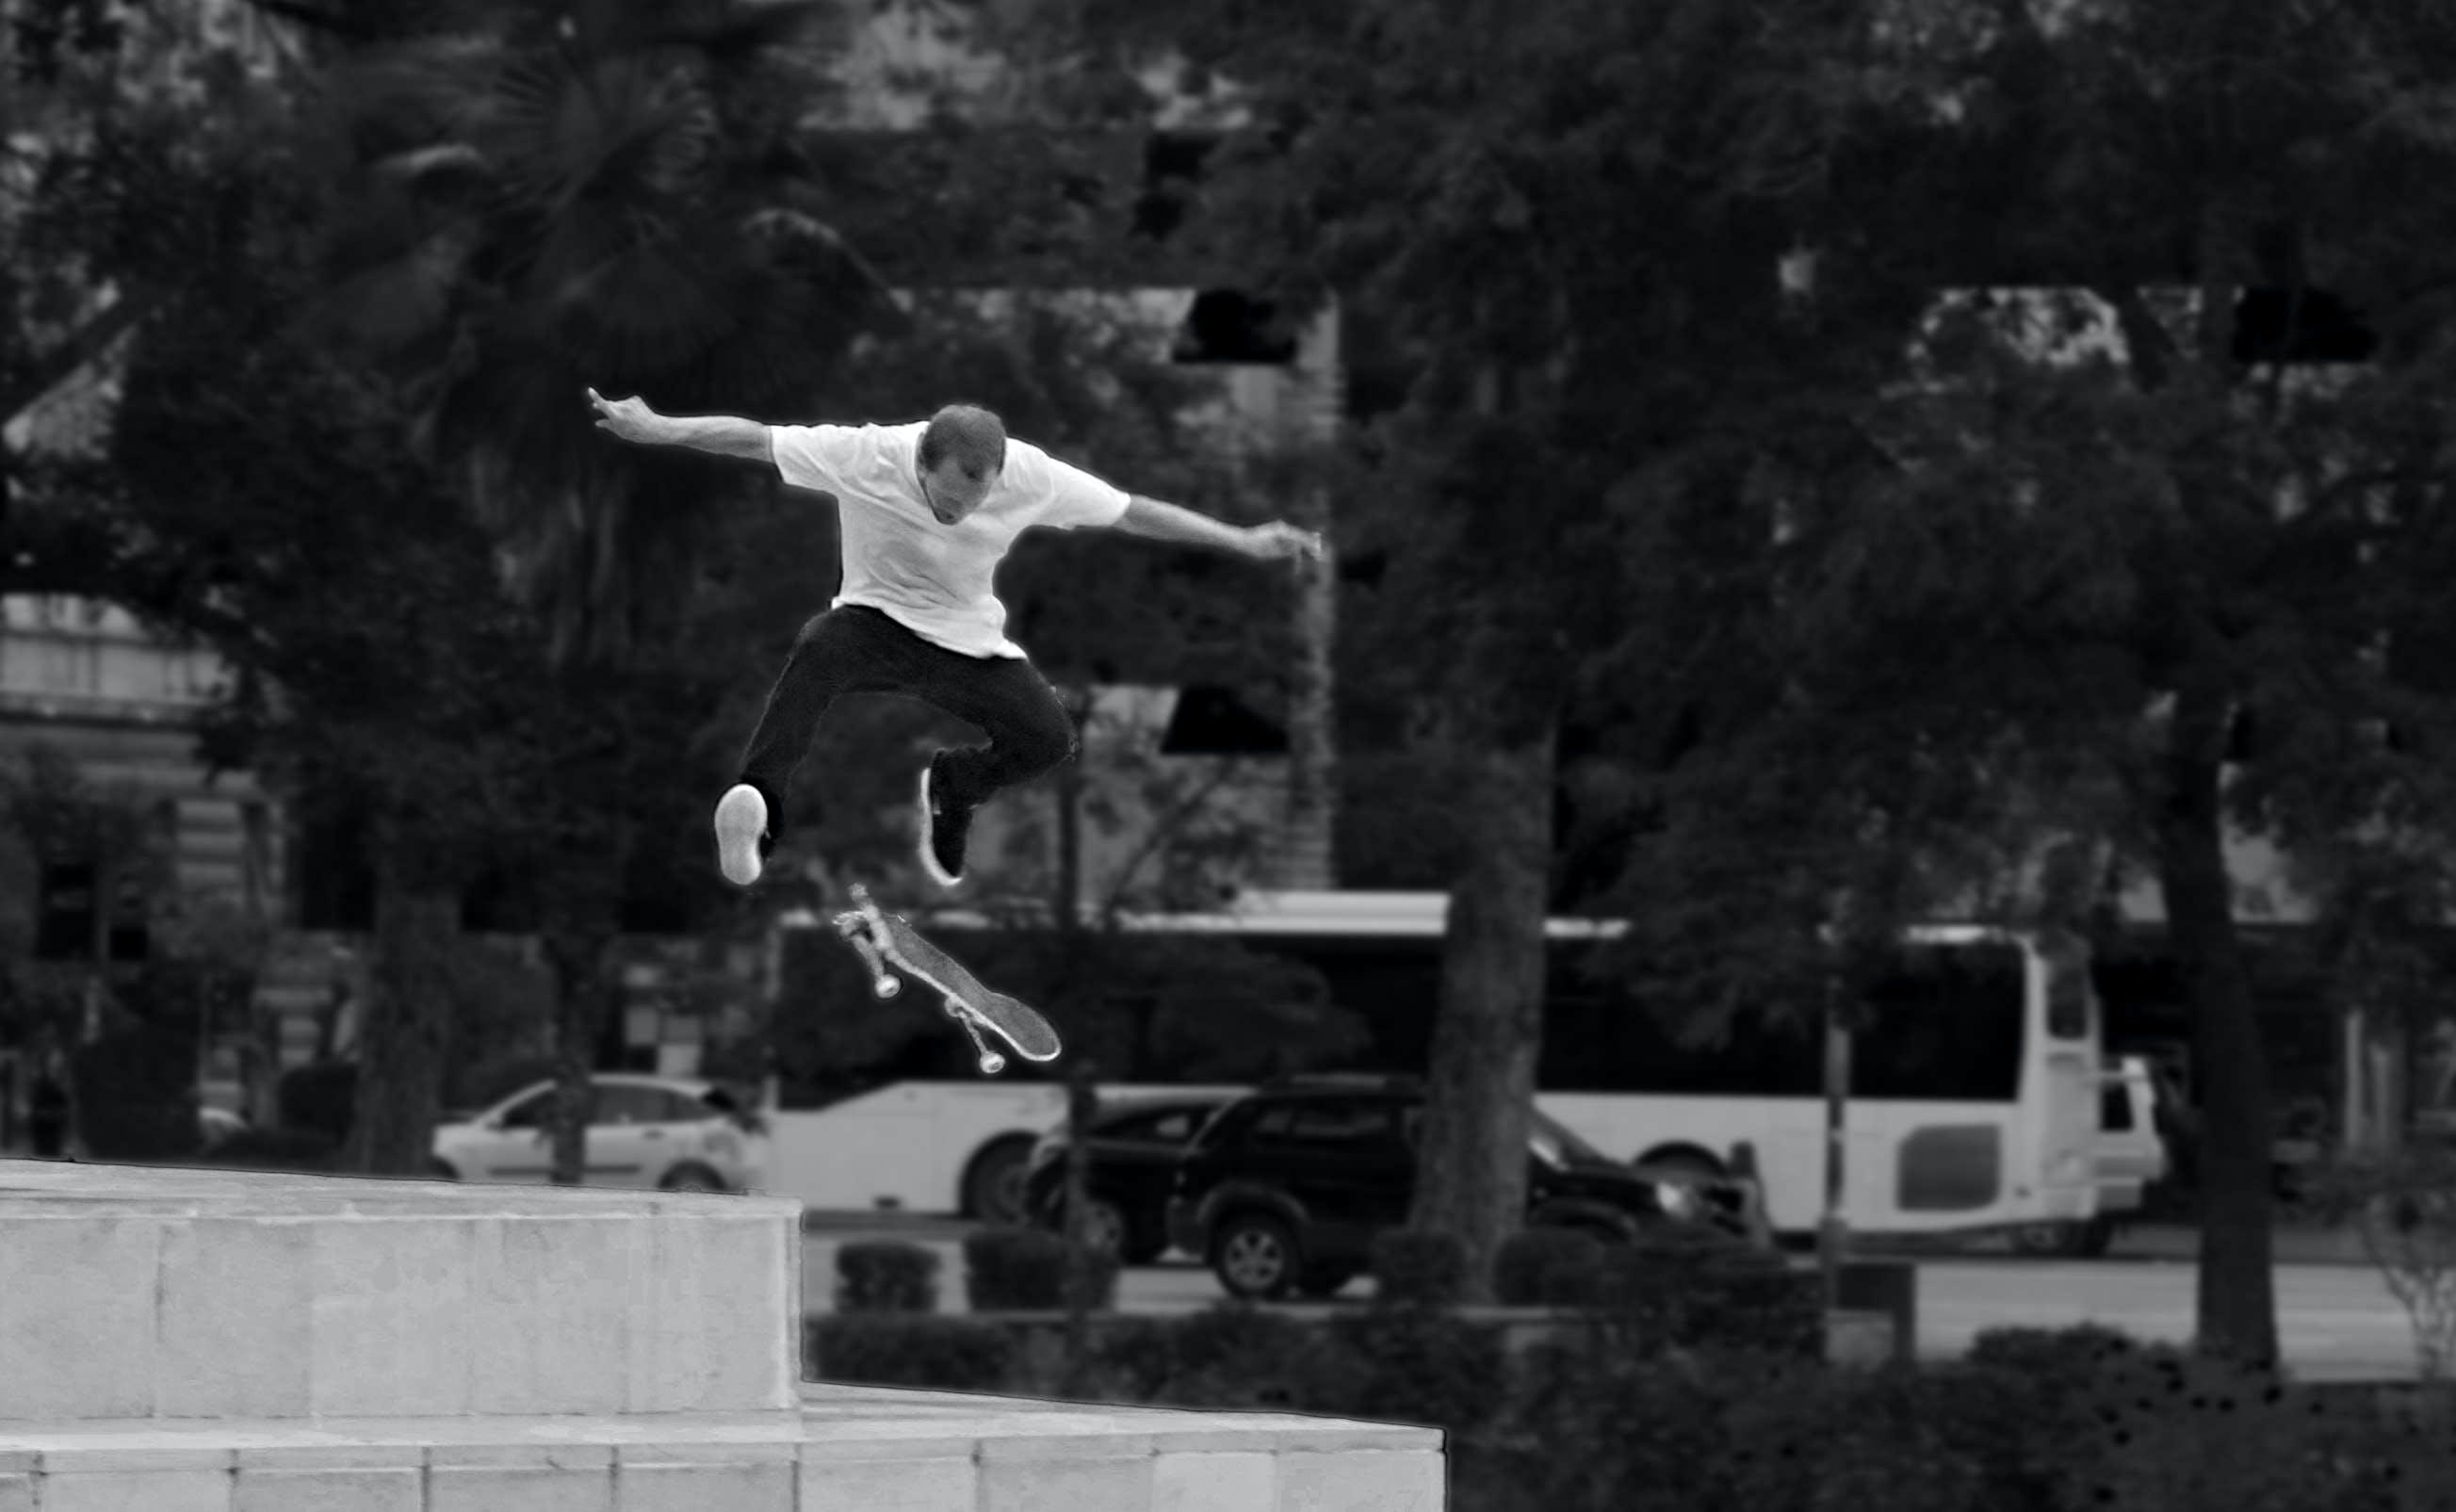 Man in White Shirt and Black Pants Playing Skateboard Near Green Tree during Daytime